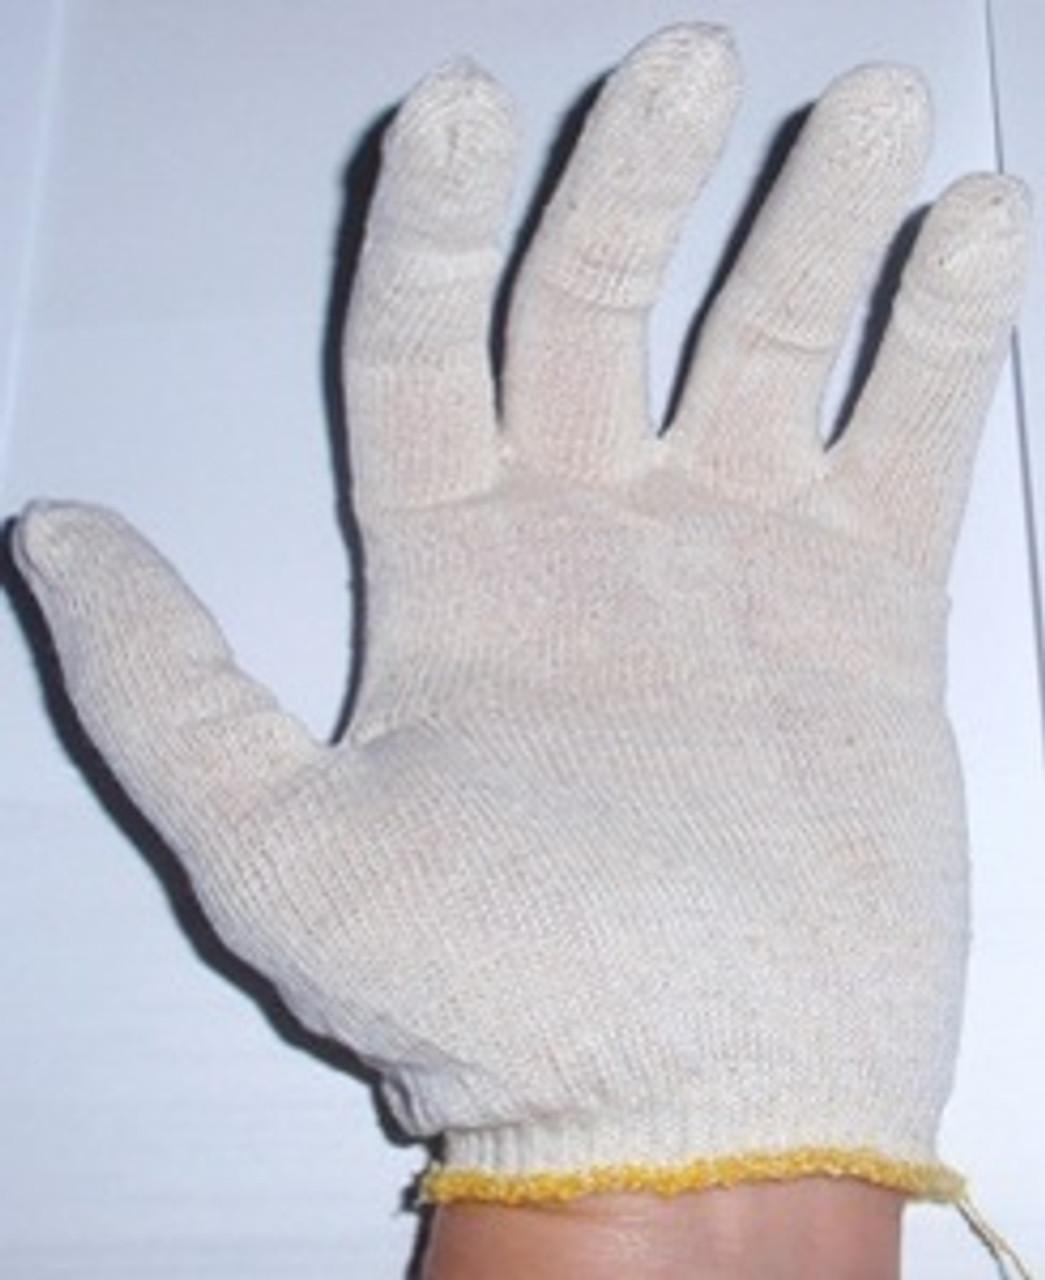 Womens Inspection Gloves 100% Cotton Liner 1dz (m-13650)